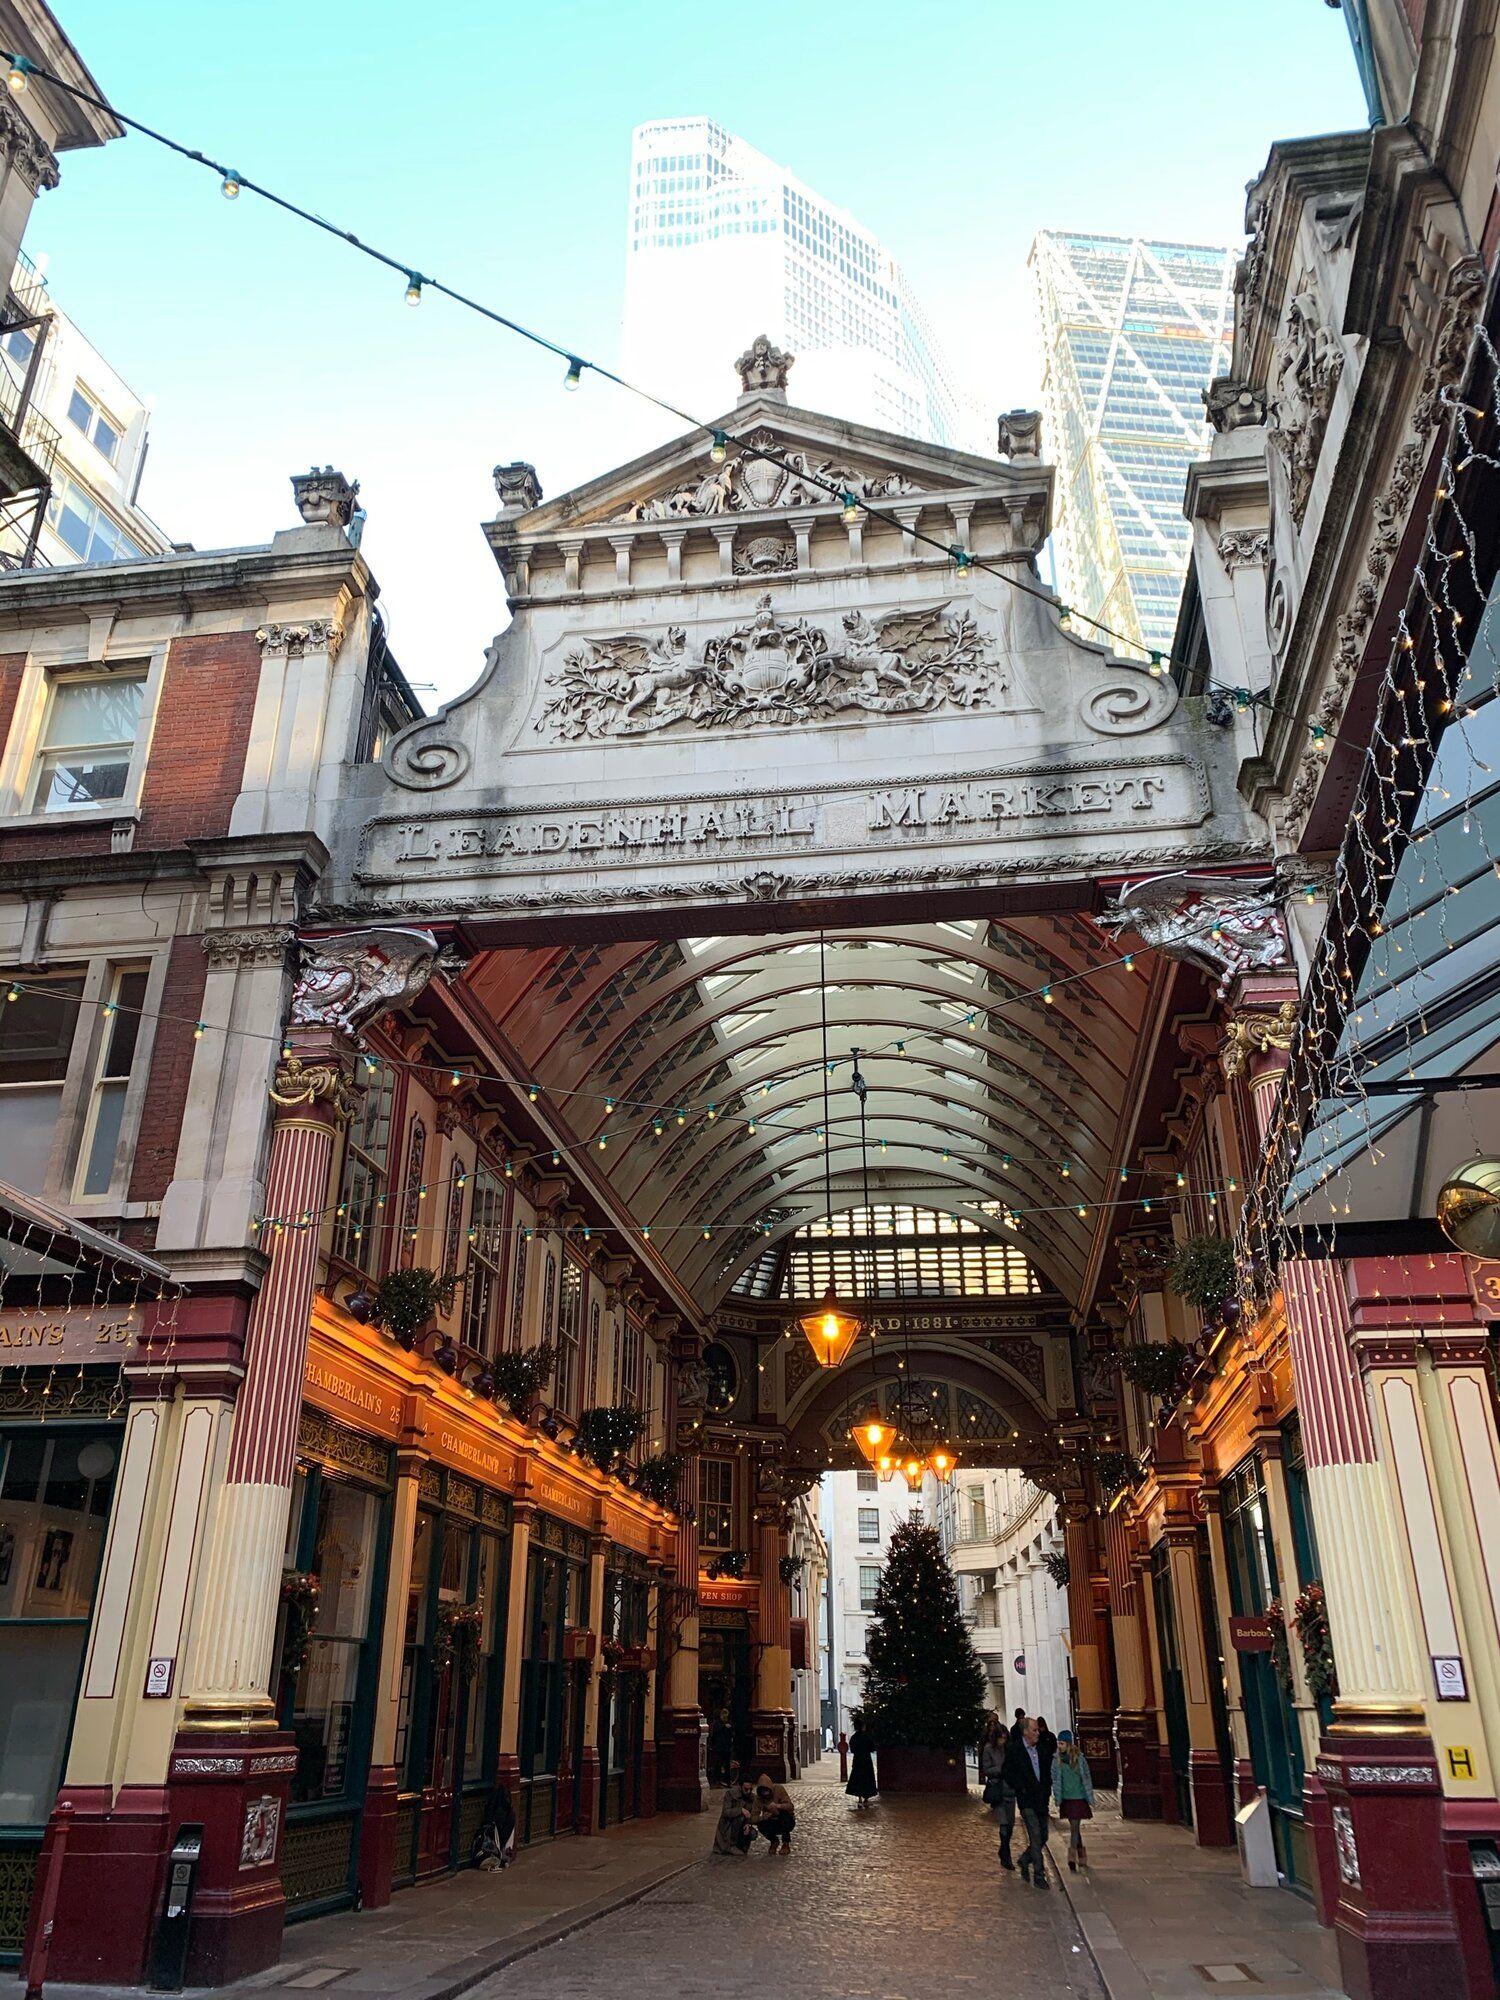 Leadenhall Market London in 2020 Leadenhall market